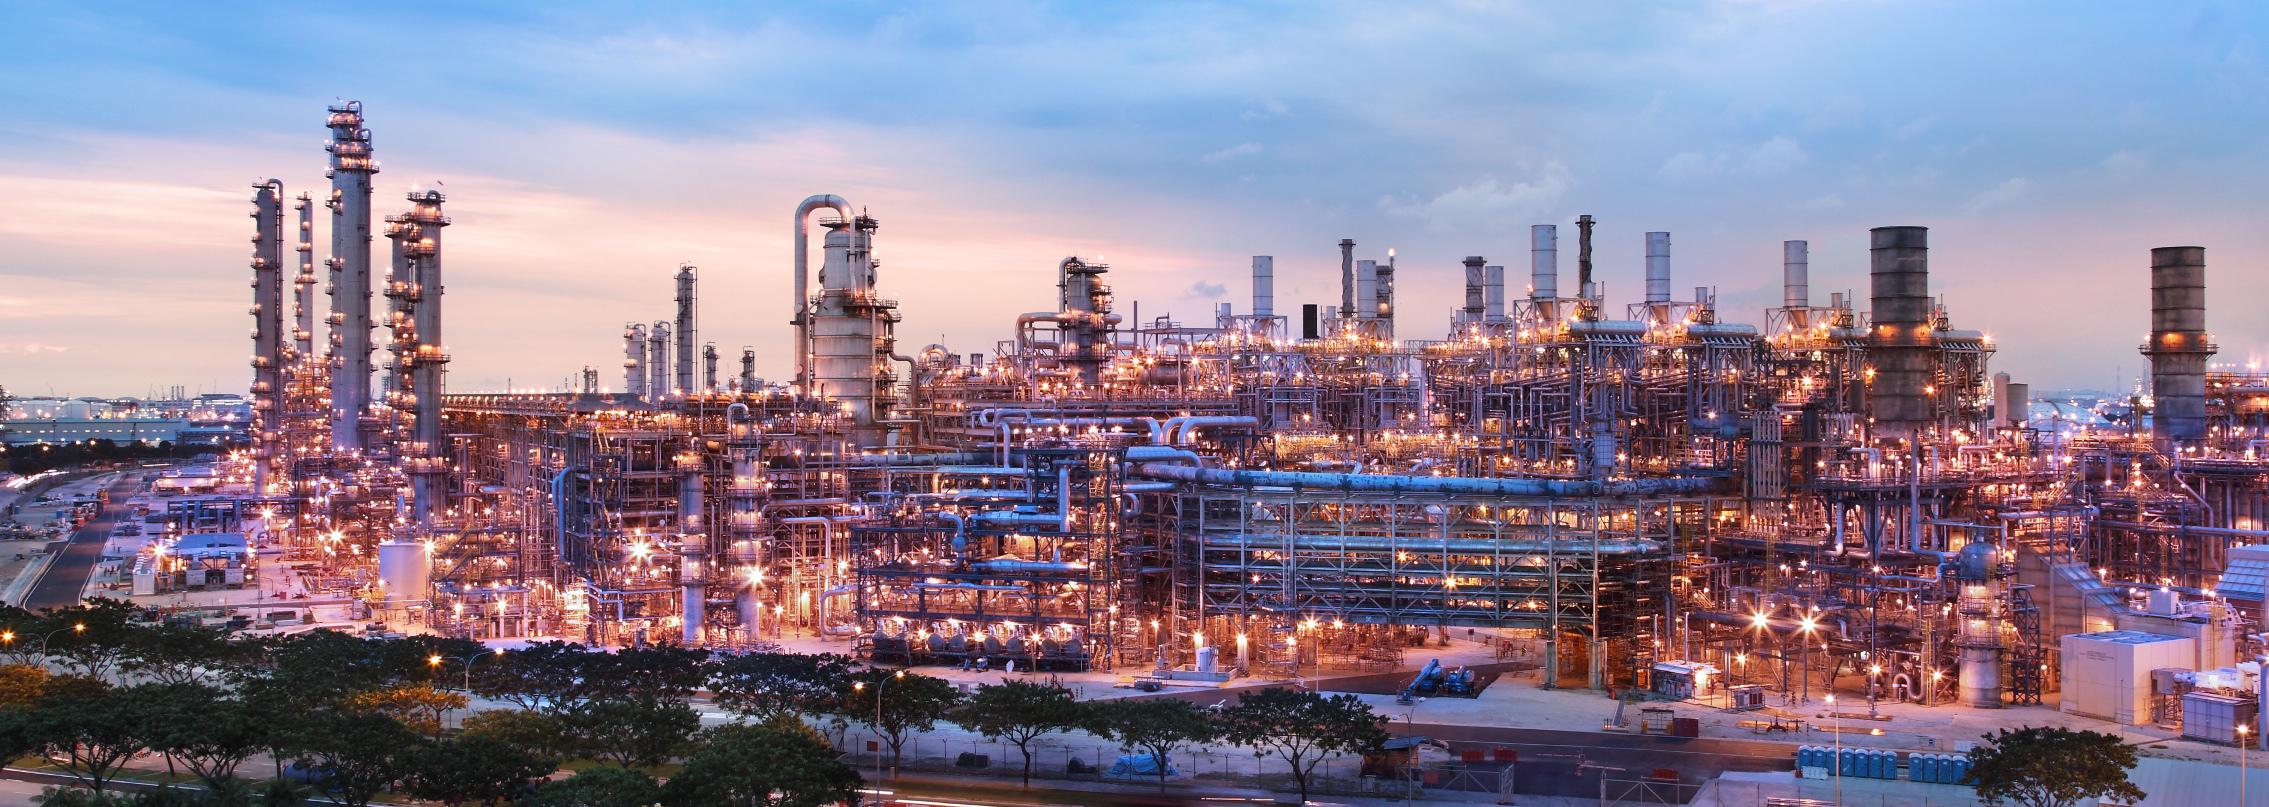 Singapore_Chemical_Plant_Expansion_photo